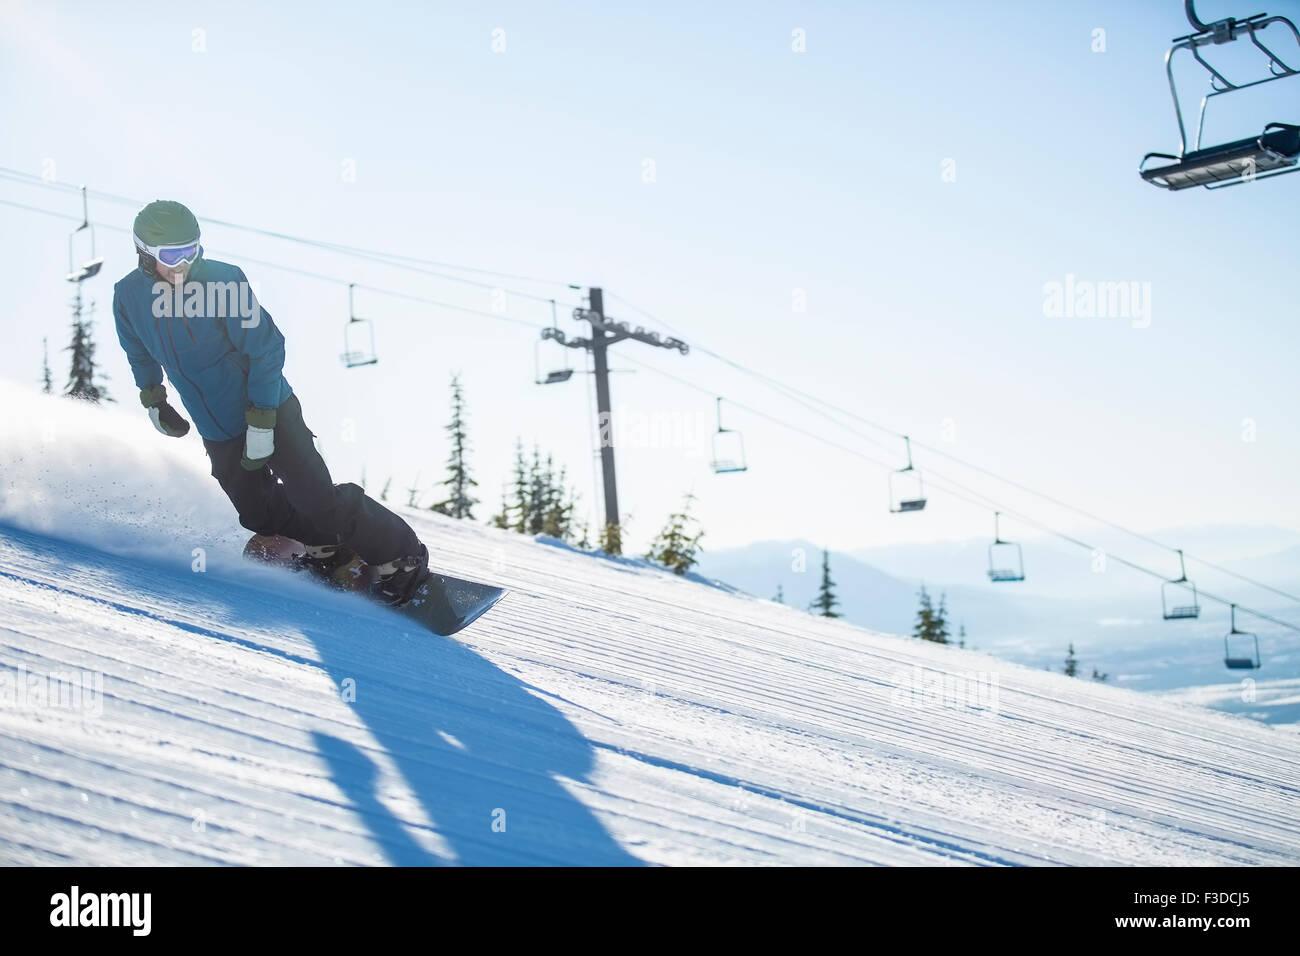 Hombre Downhill Snowboard Imagen De Stock